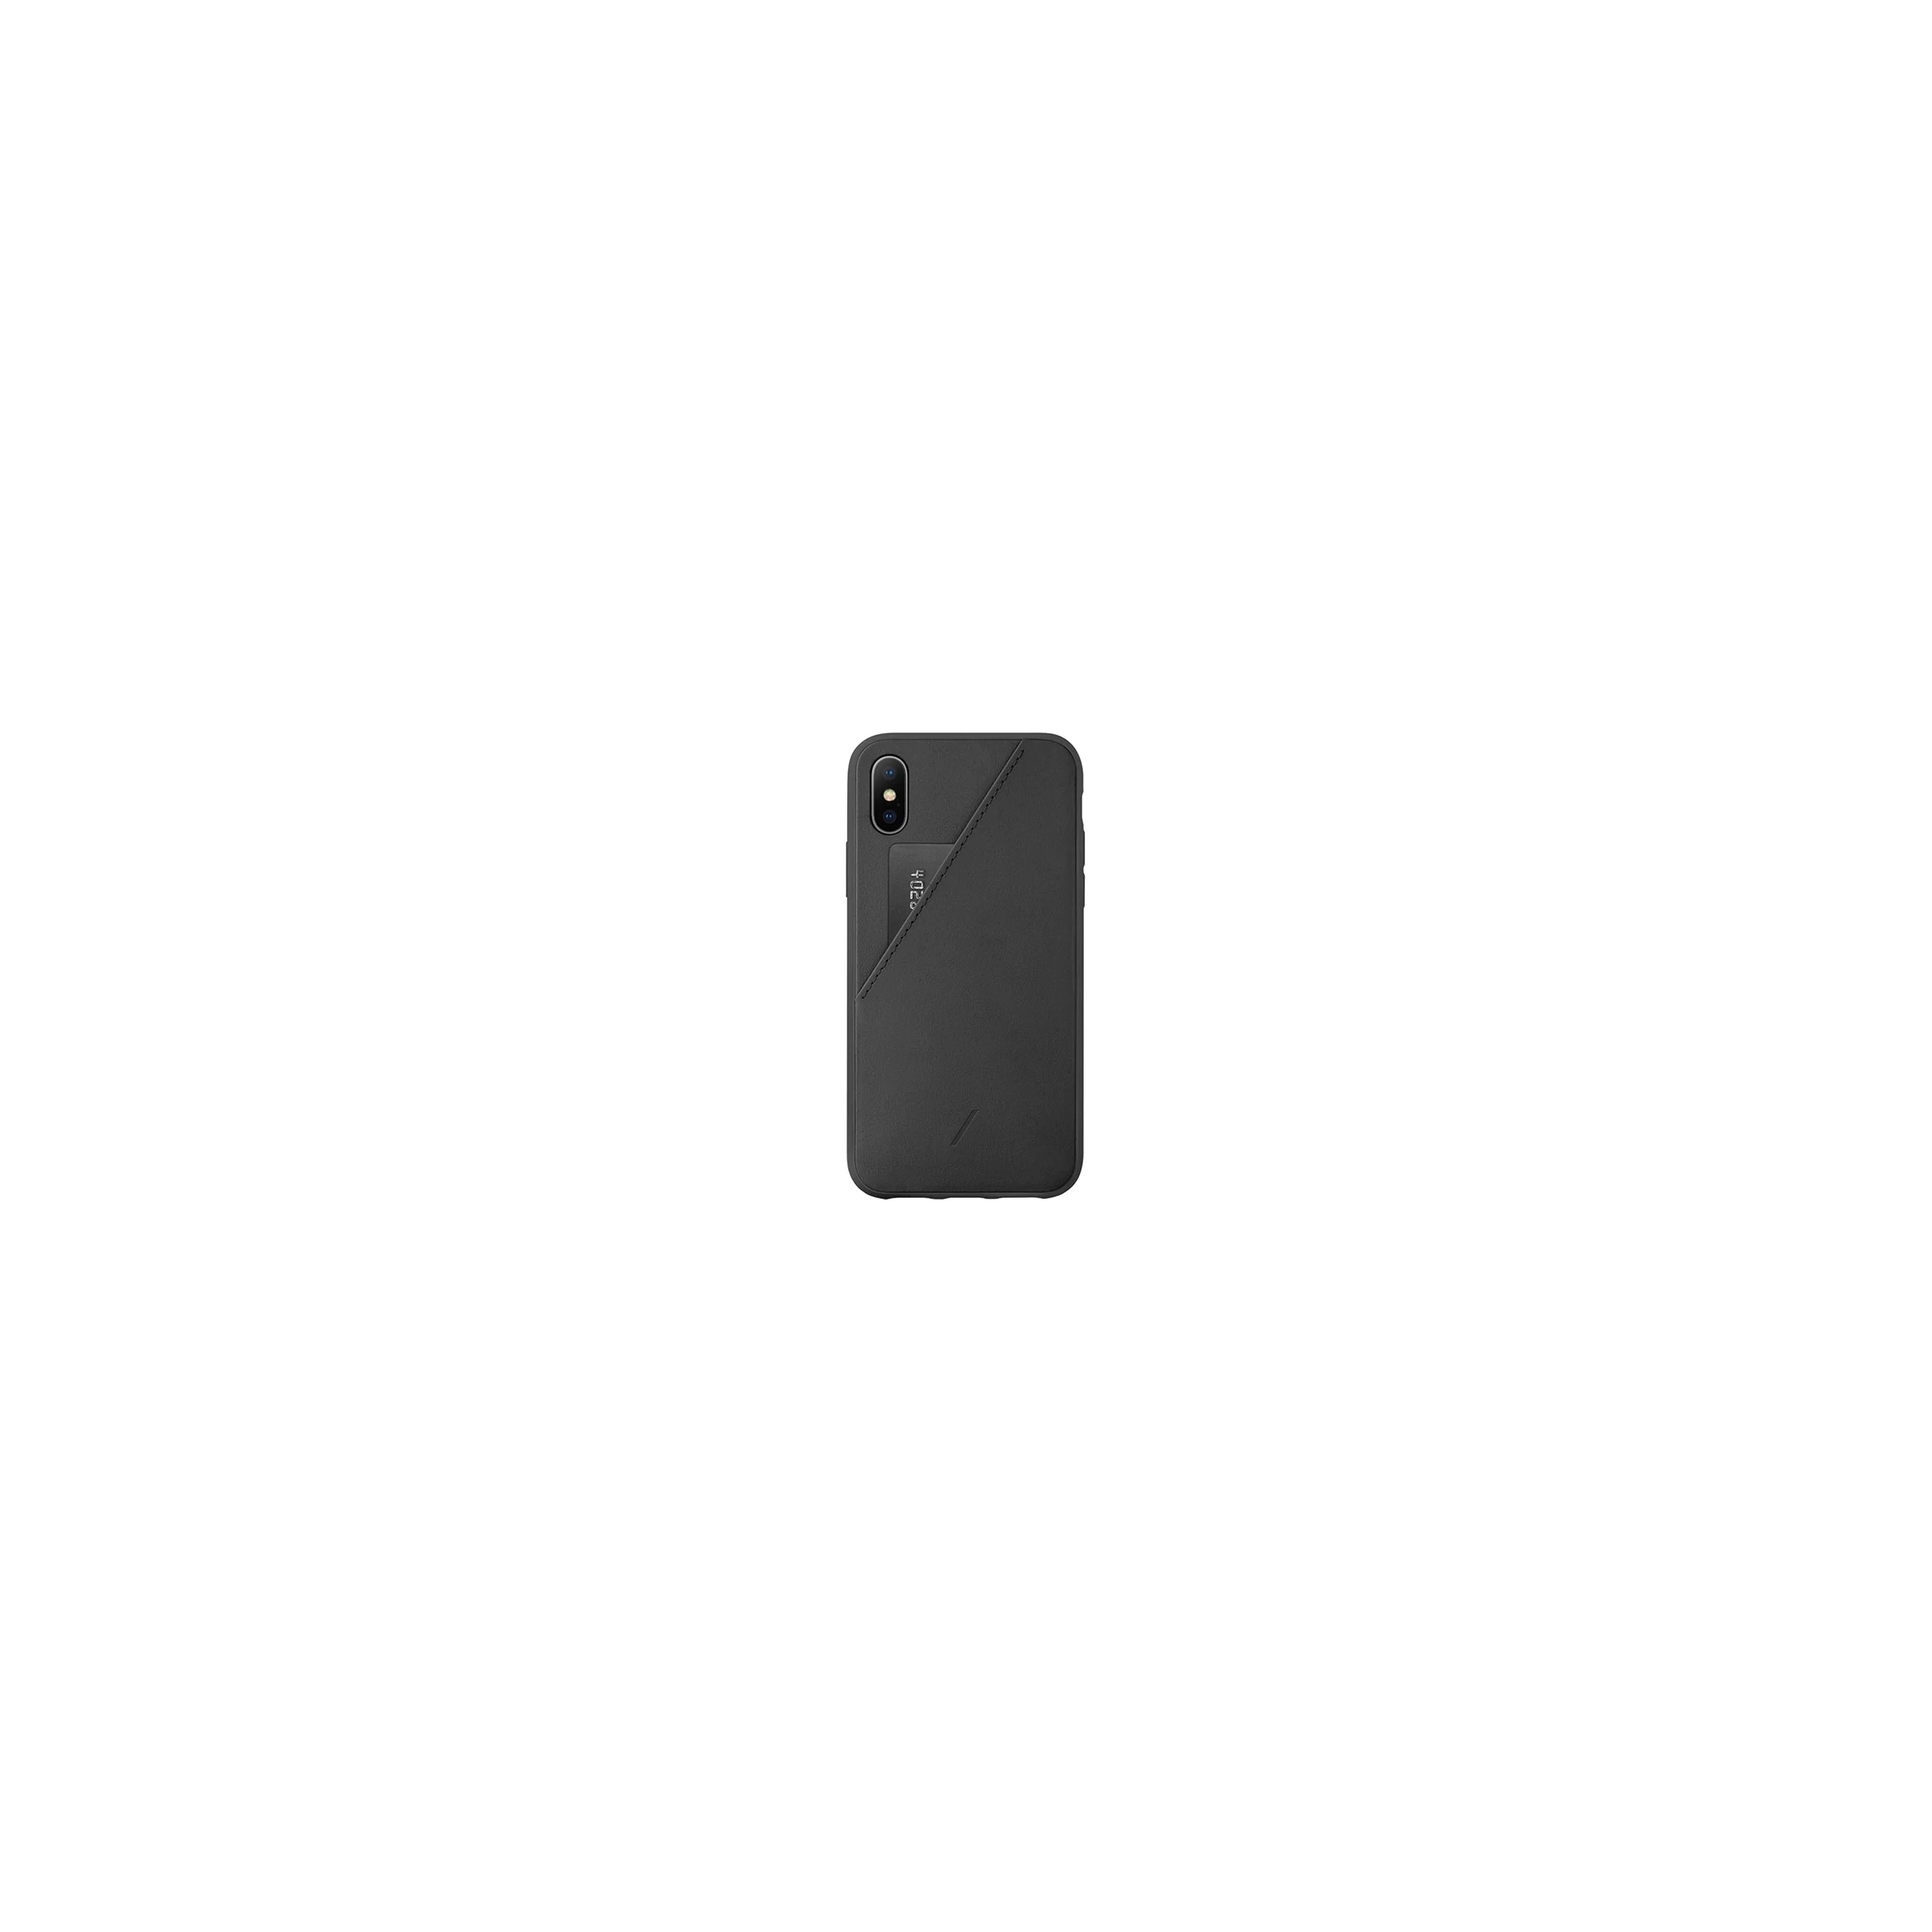 Clic iPhone XS Max - Black